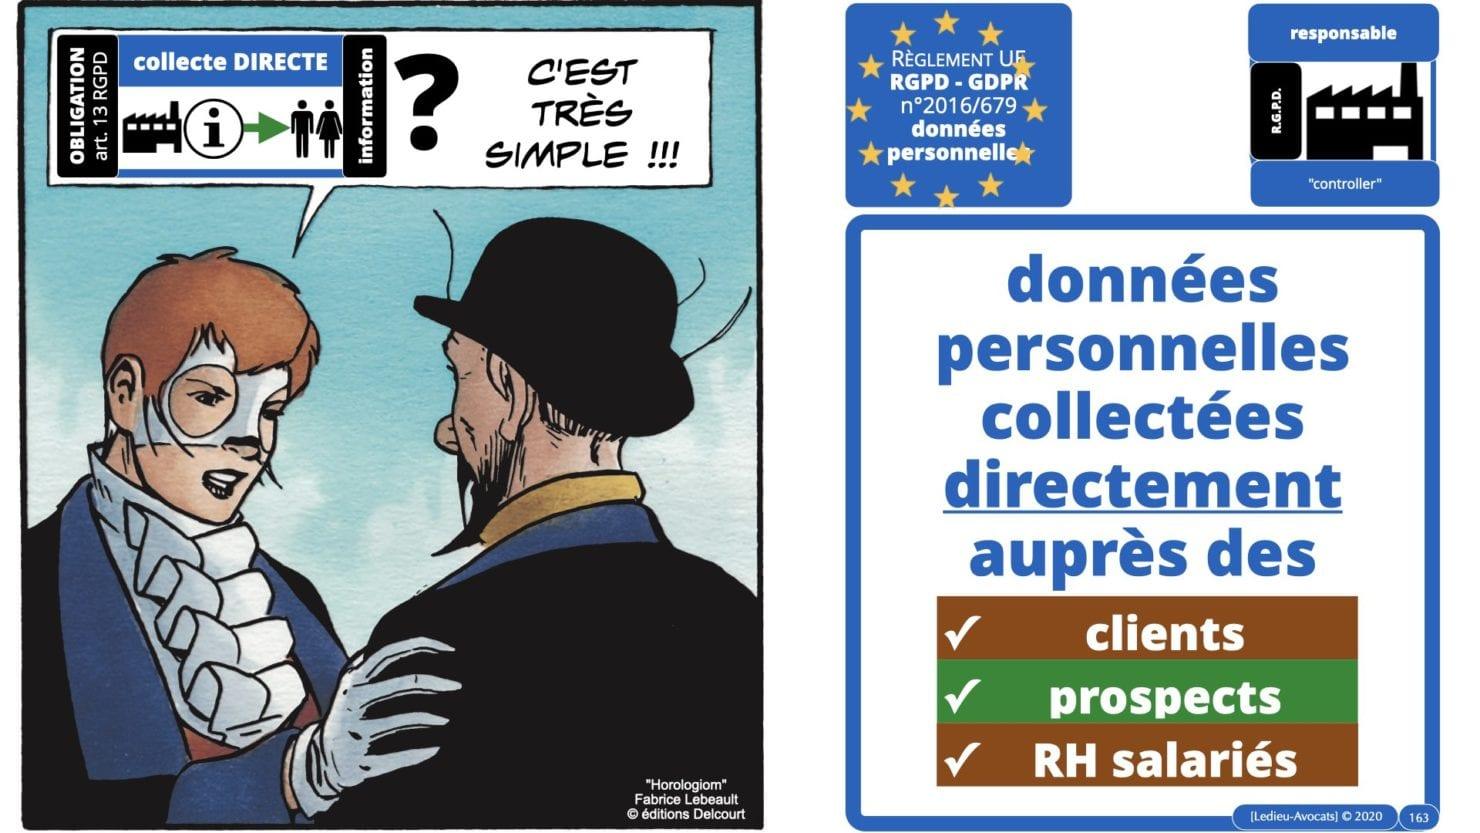 RGPD e-Privacy principes actualité jurisprudence ©Ledieu-Avocats 25-06-2021.163